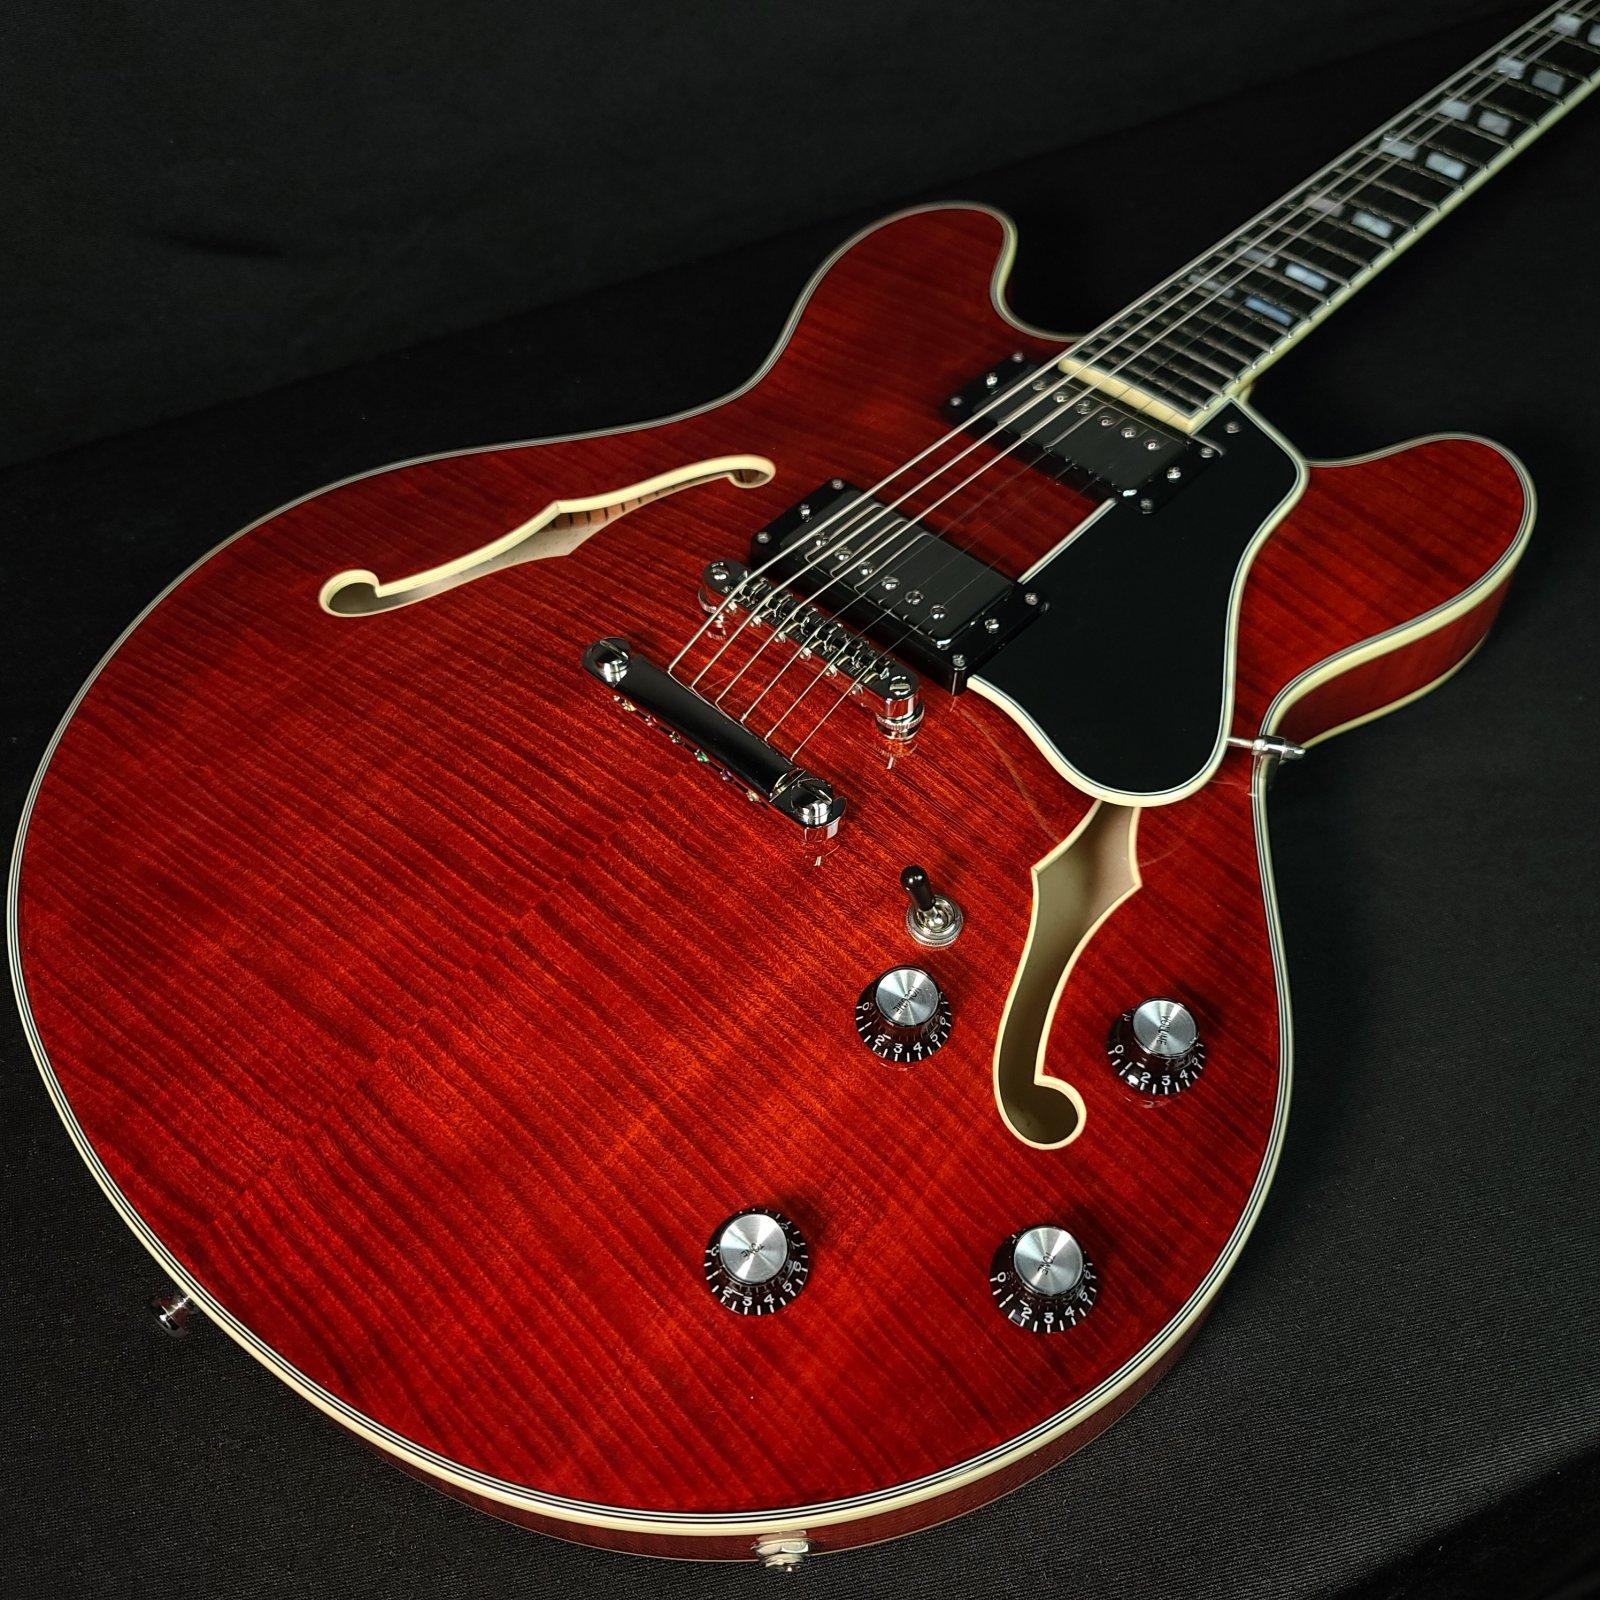 Eastman T486 #0431 Classic Finish Semi Hollow Electric Guitar, Hard Case